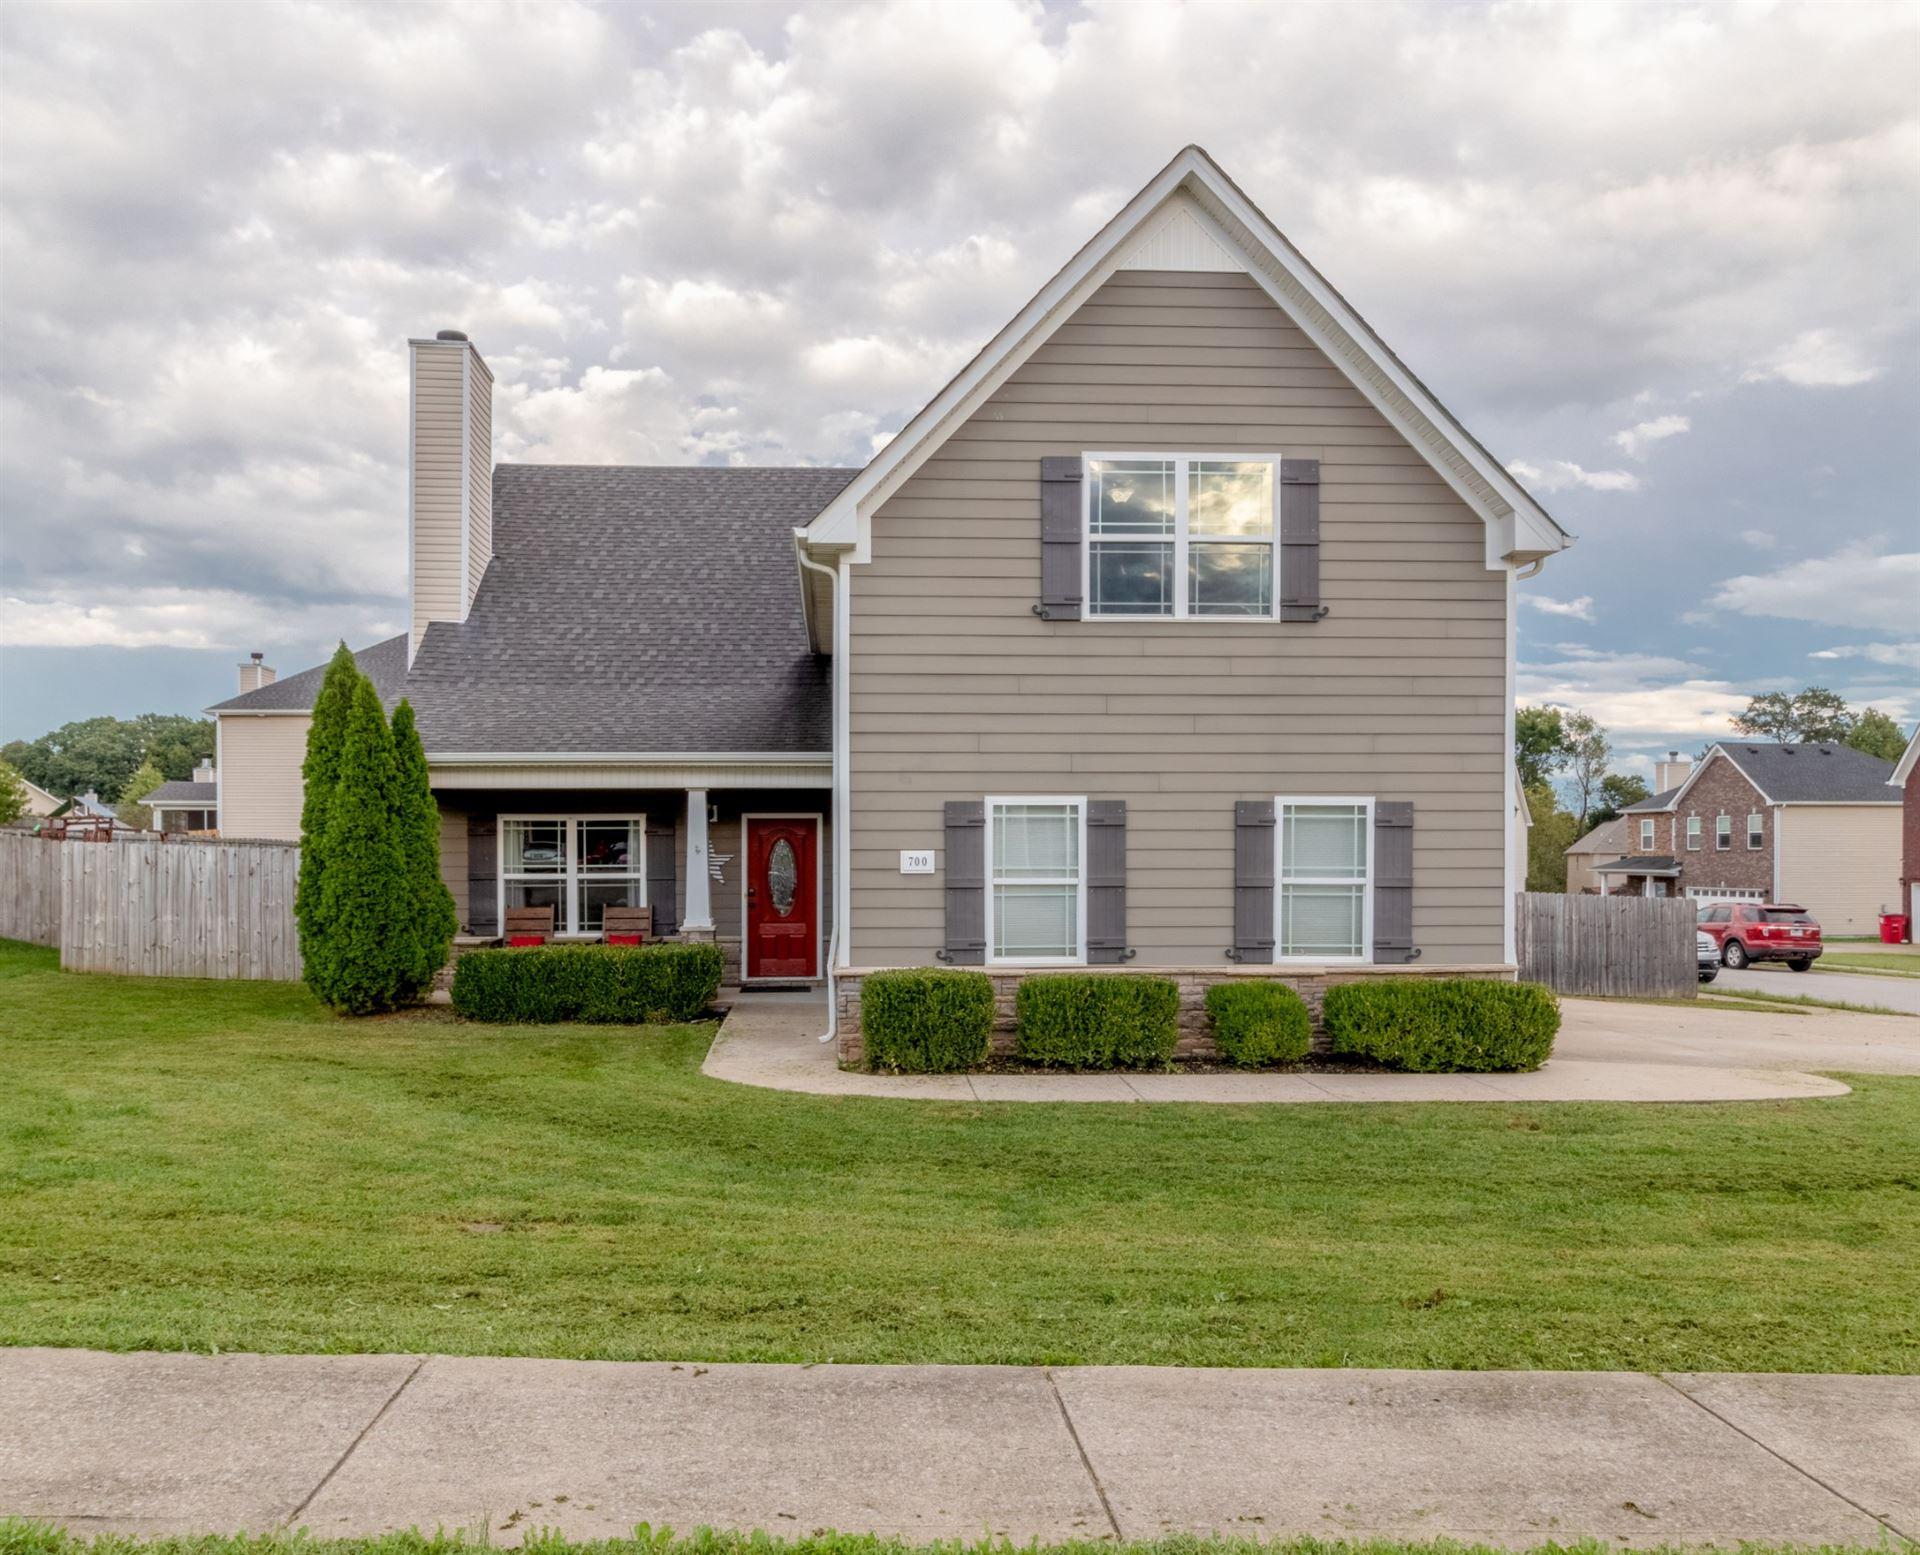 700 Evergreen Ct, Clarksville, TN 37040 - MLS#: 2298720